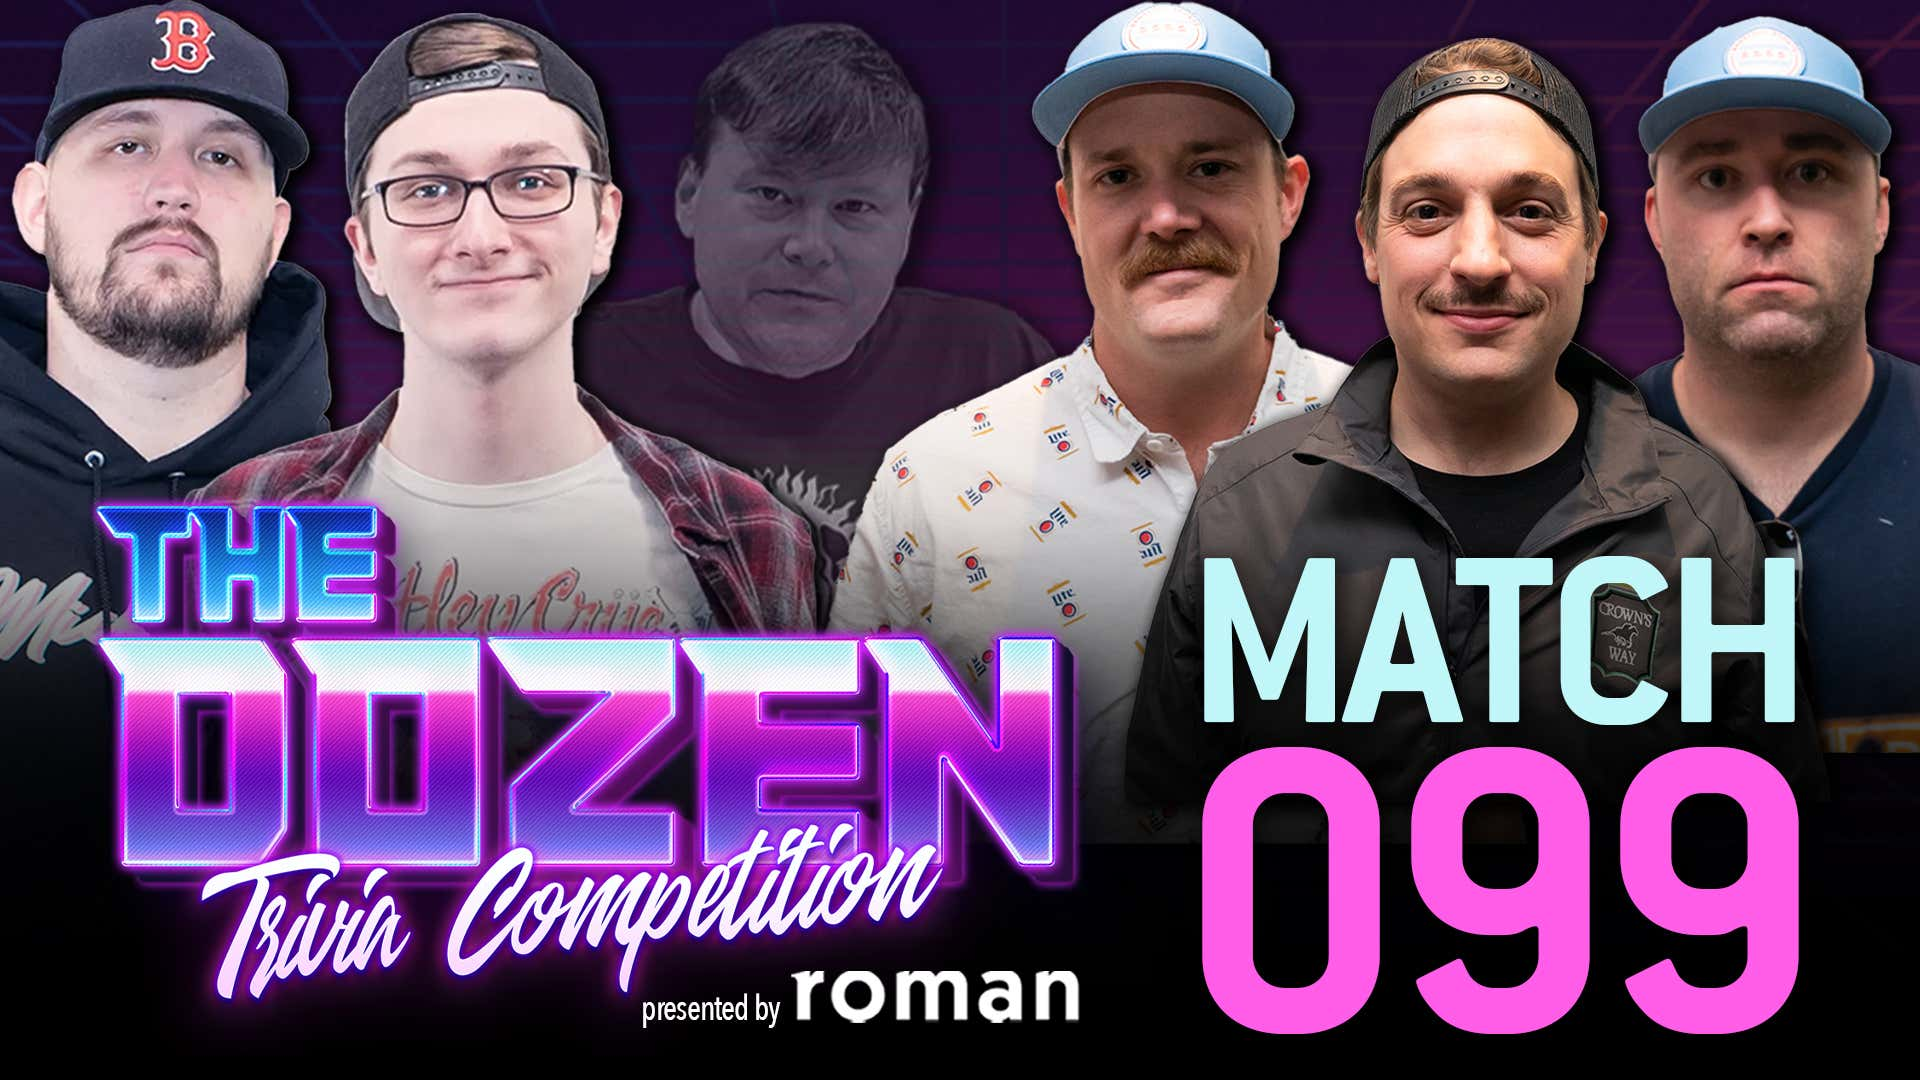 The Dozen: Trivia Competition pres. by Roman - Coley & Robbie vs. Chicago's Carl, Chief, & White Sox Dave